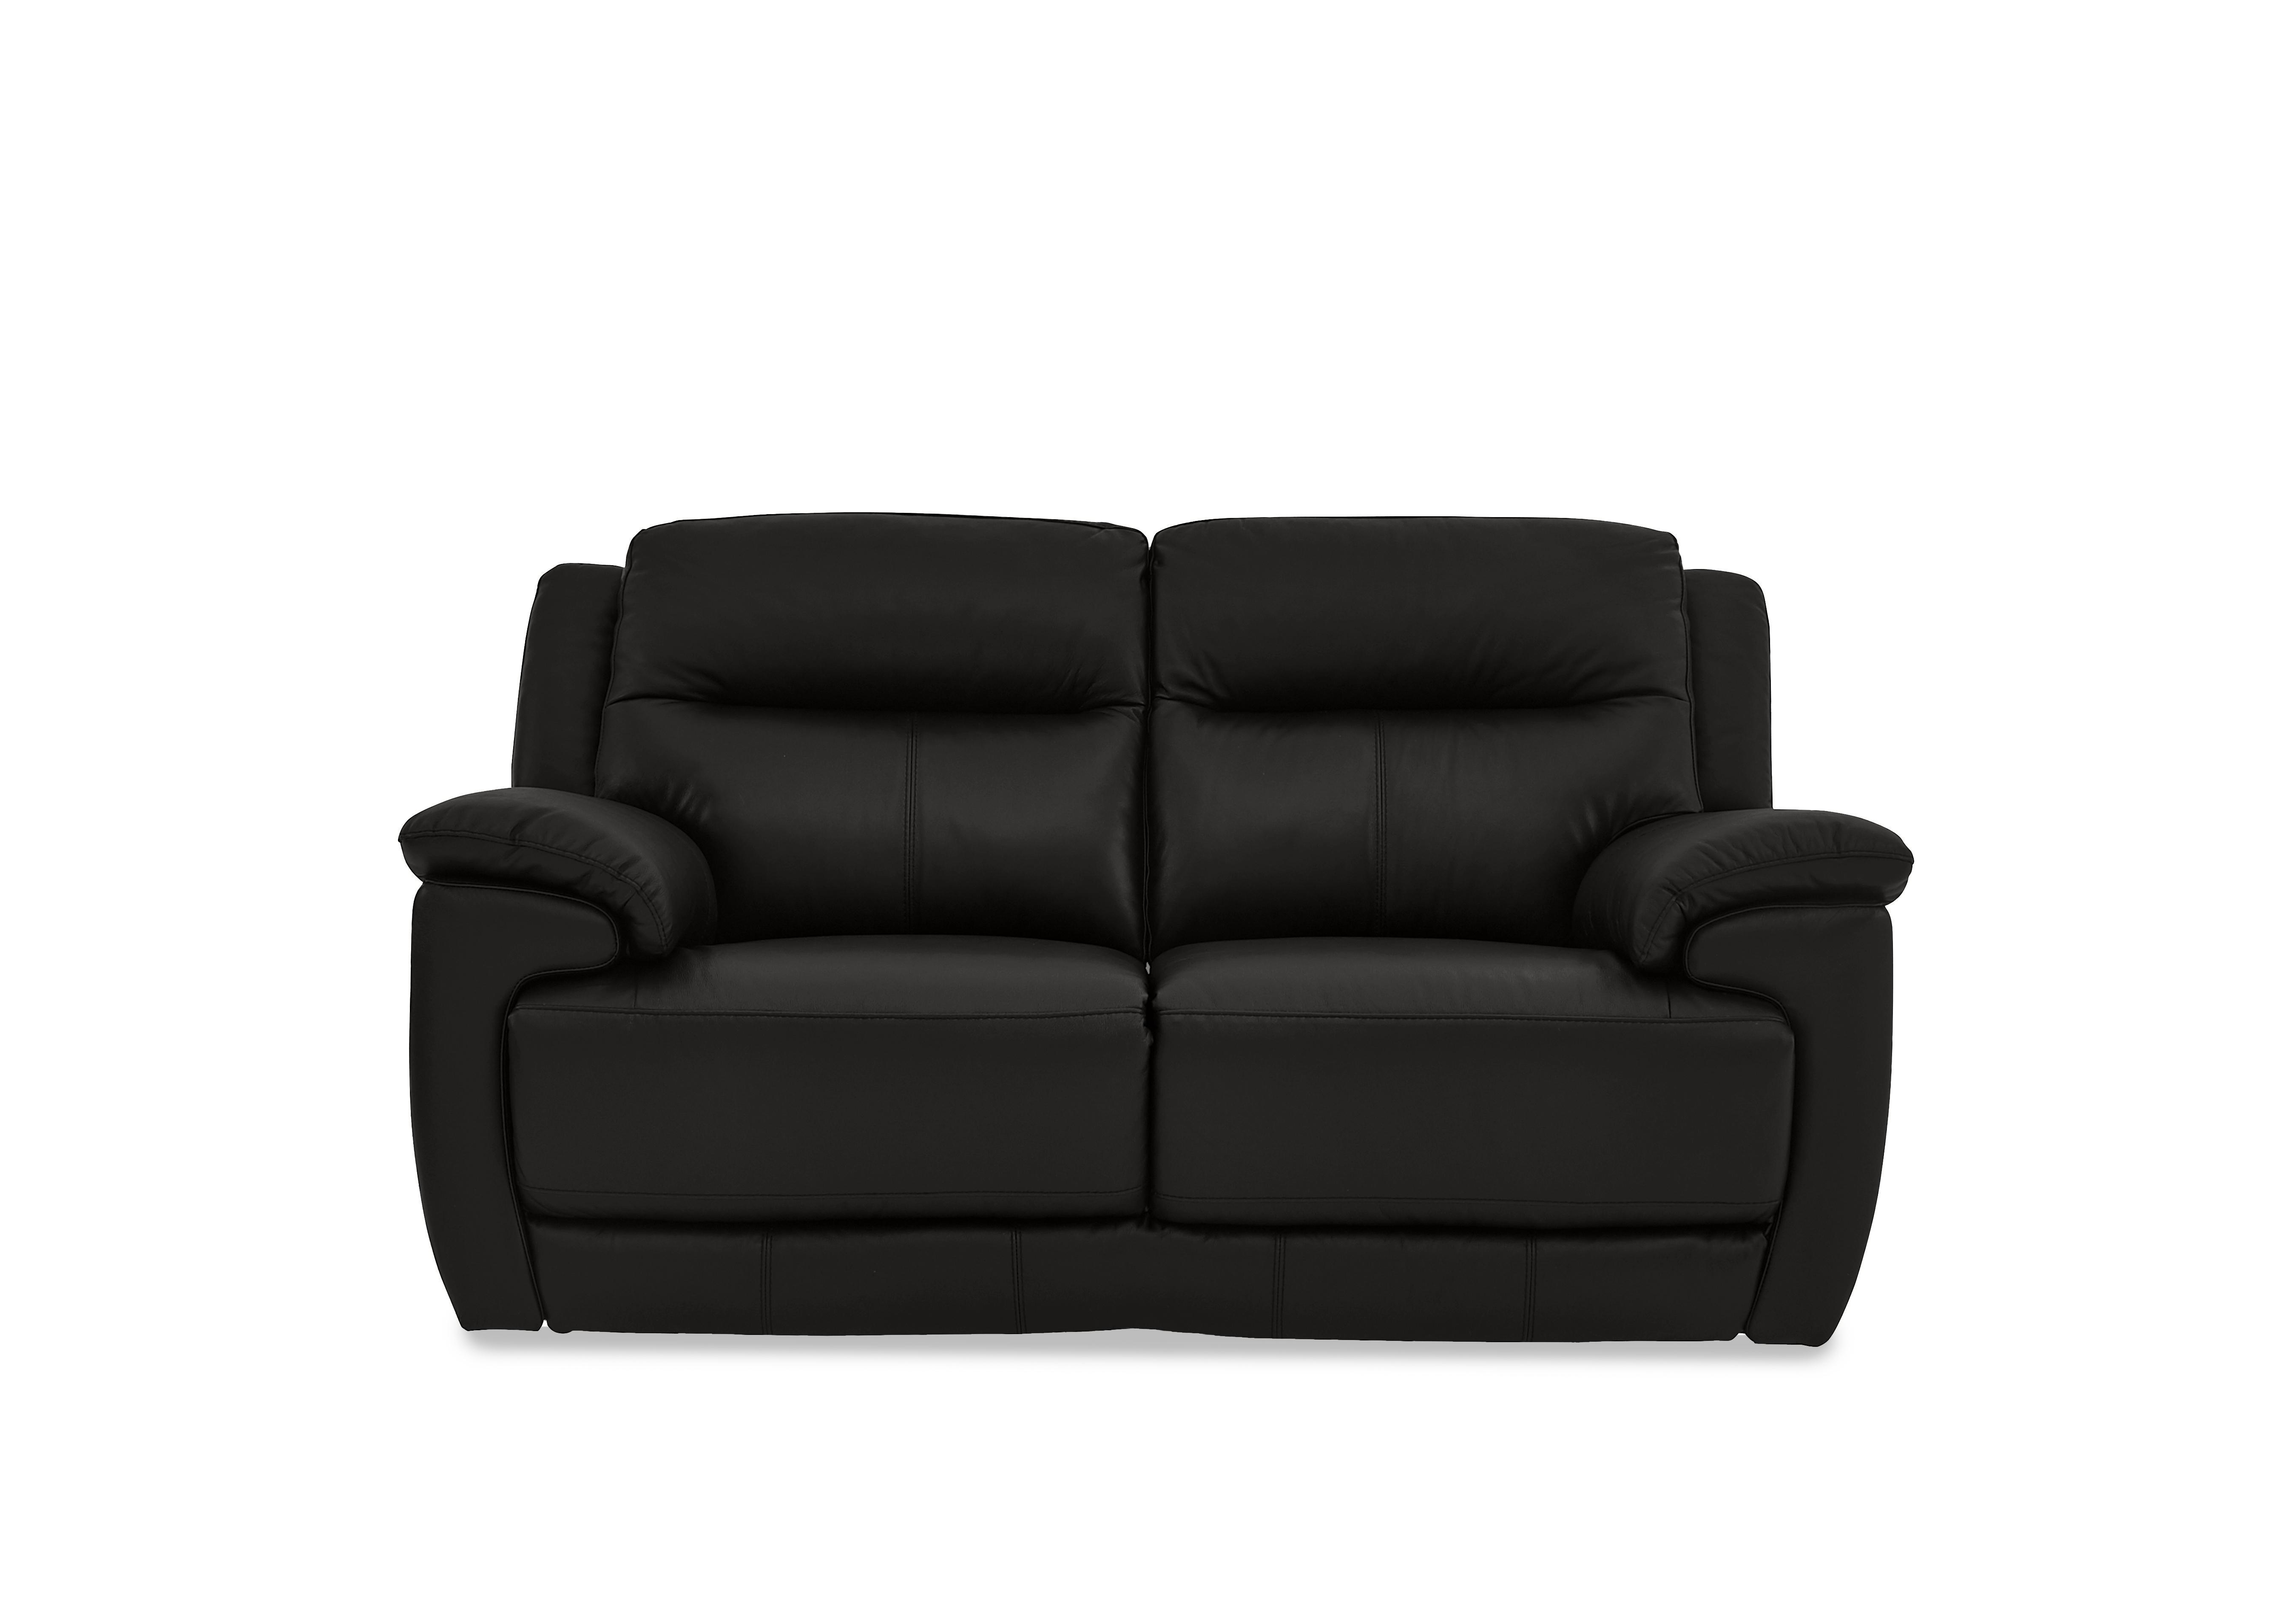 Furniture Village Gallows Corner black leather recliner sofa furniture village | sofa beds grey